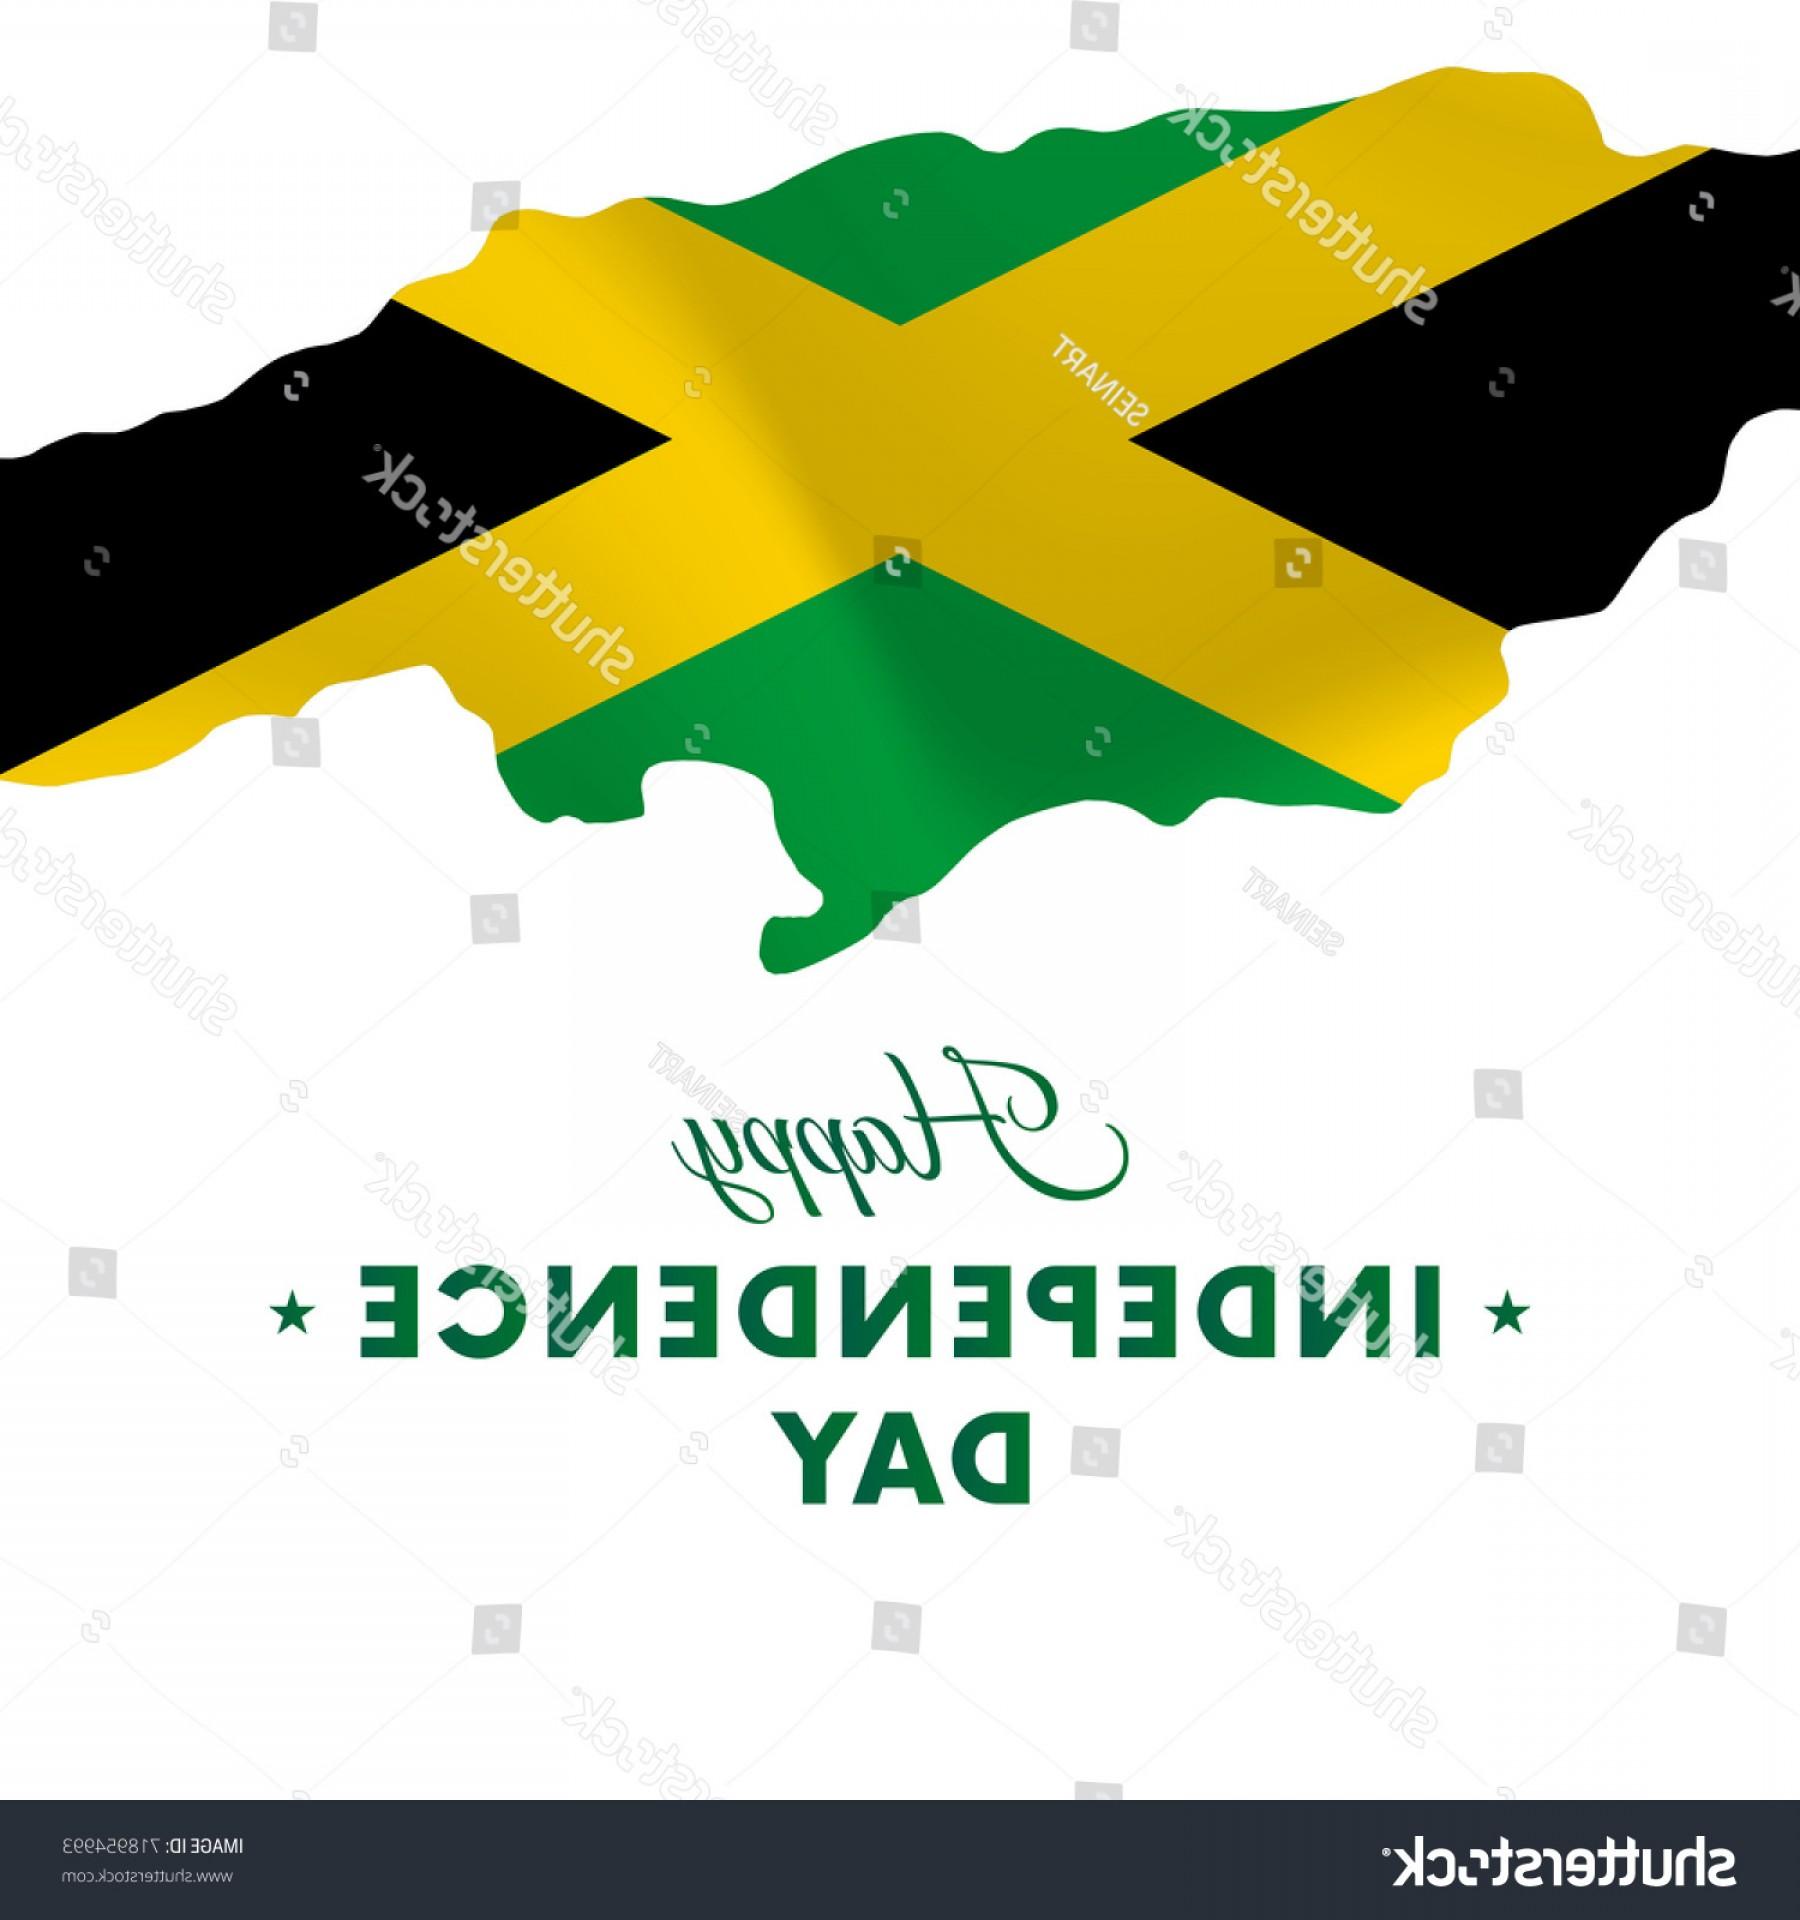 1800x1920 Jamaica Independence Day Map Vector Illustration Sohadacouri